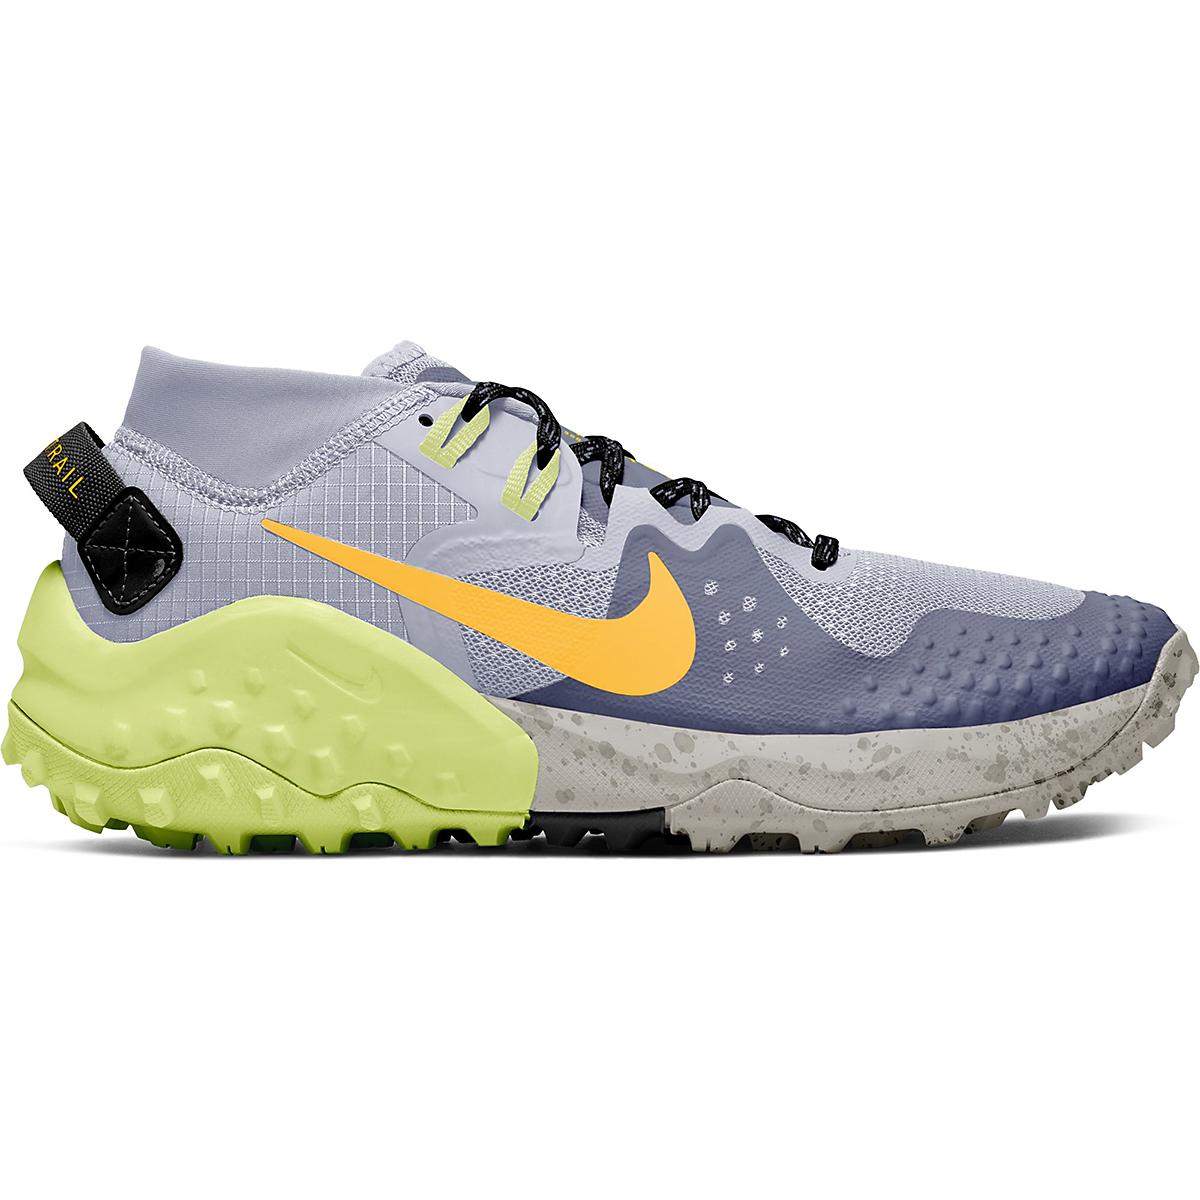 Women's Nike Wildhorse 6 Trail Running Shoe - Color: World Indigo/Laser Orange-Ghost - Size: 5 - Width: Regular, World Indigo/Laser Orange-Ghost, large, image 1